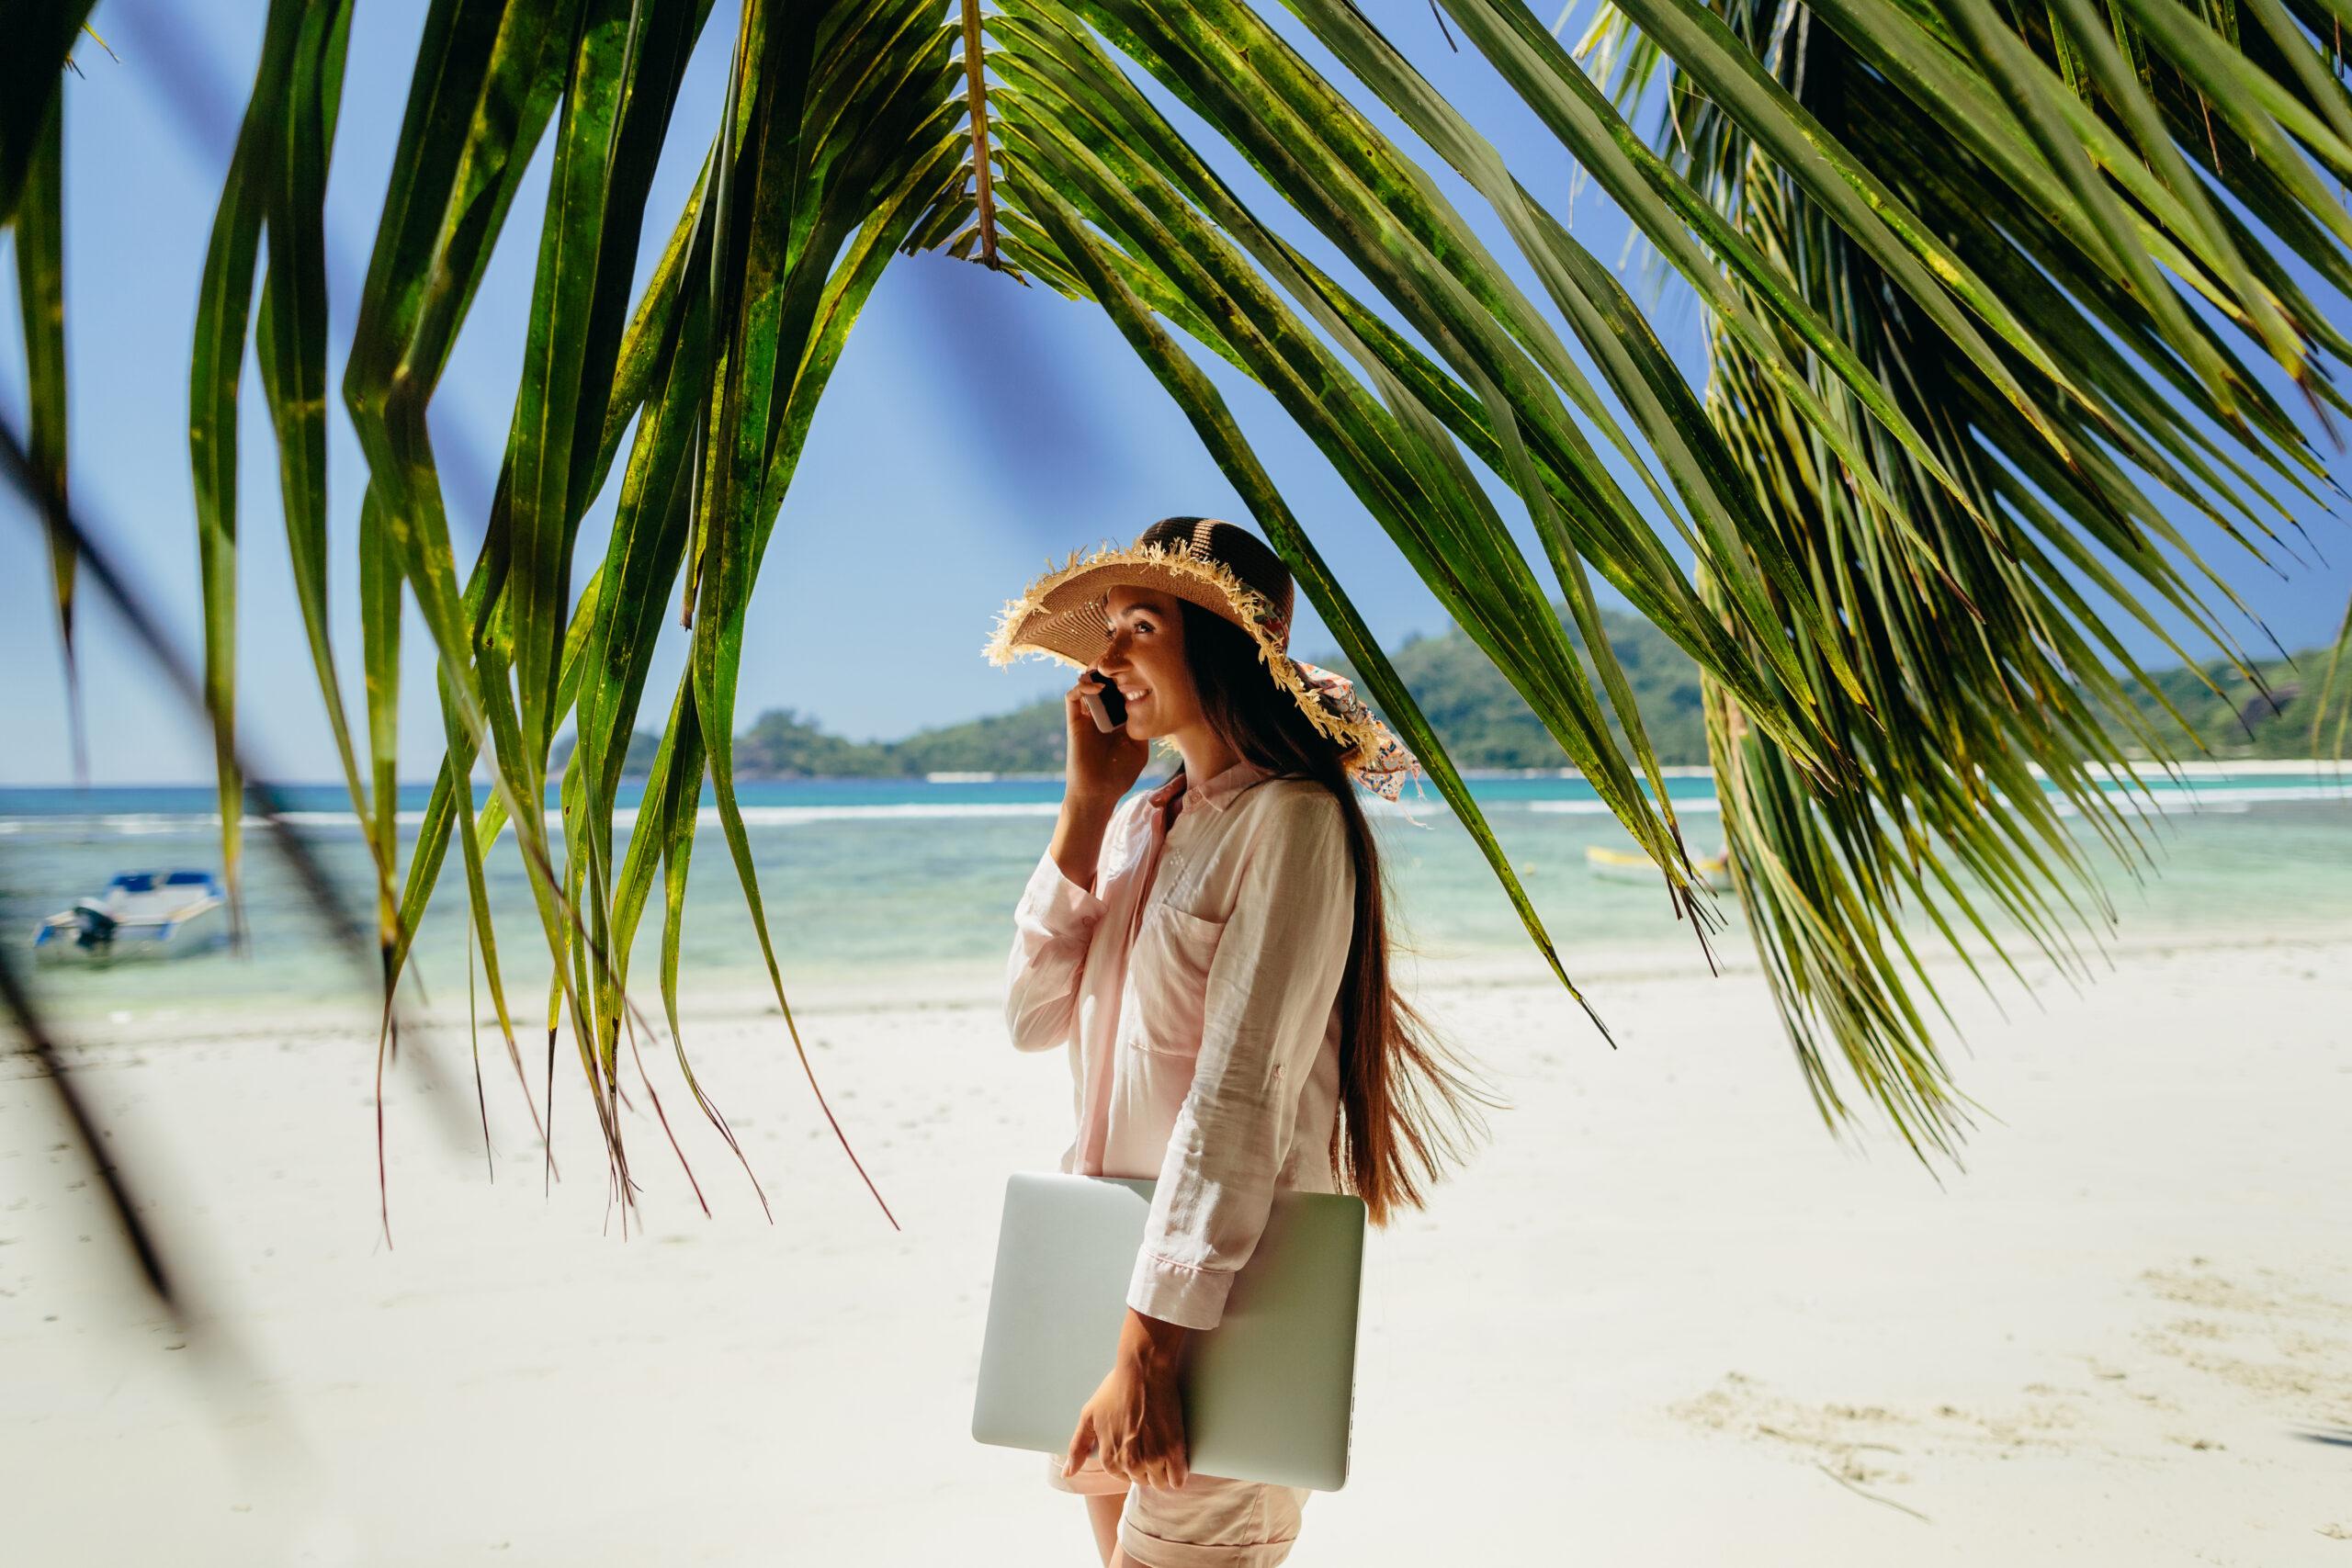 Store you belongings as a digital nomad